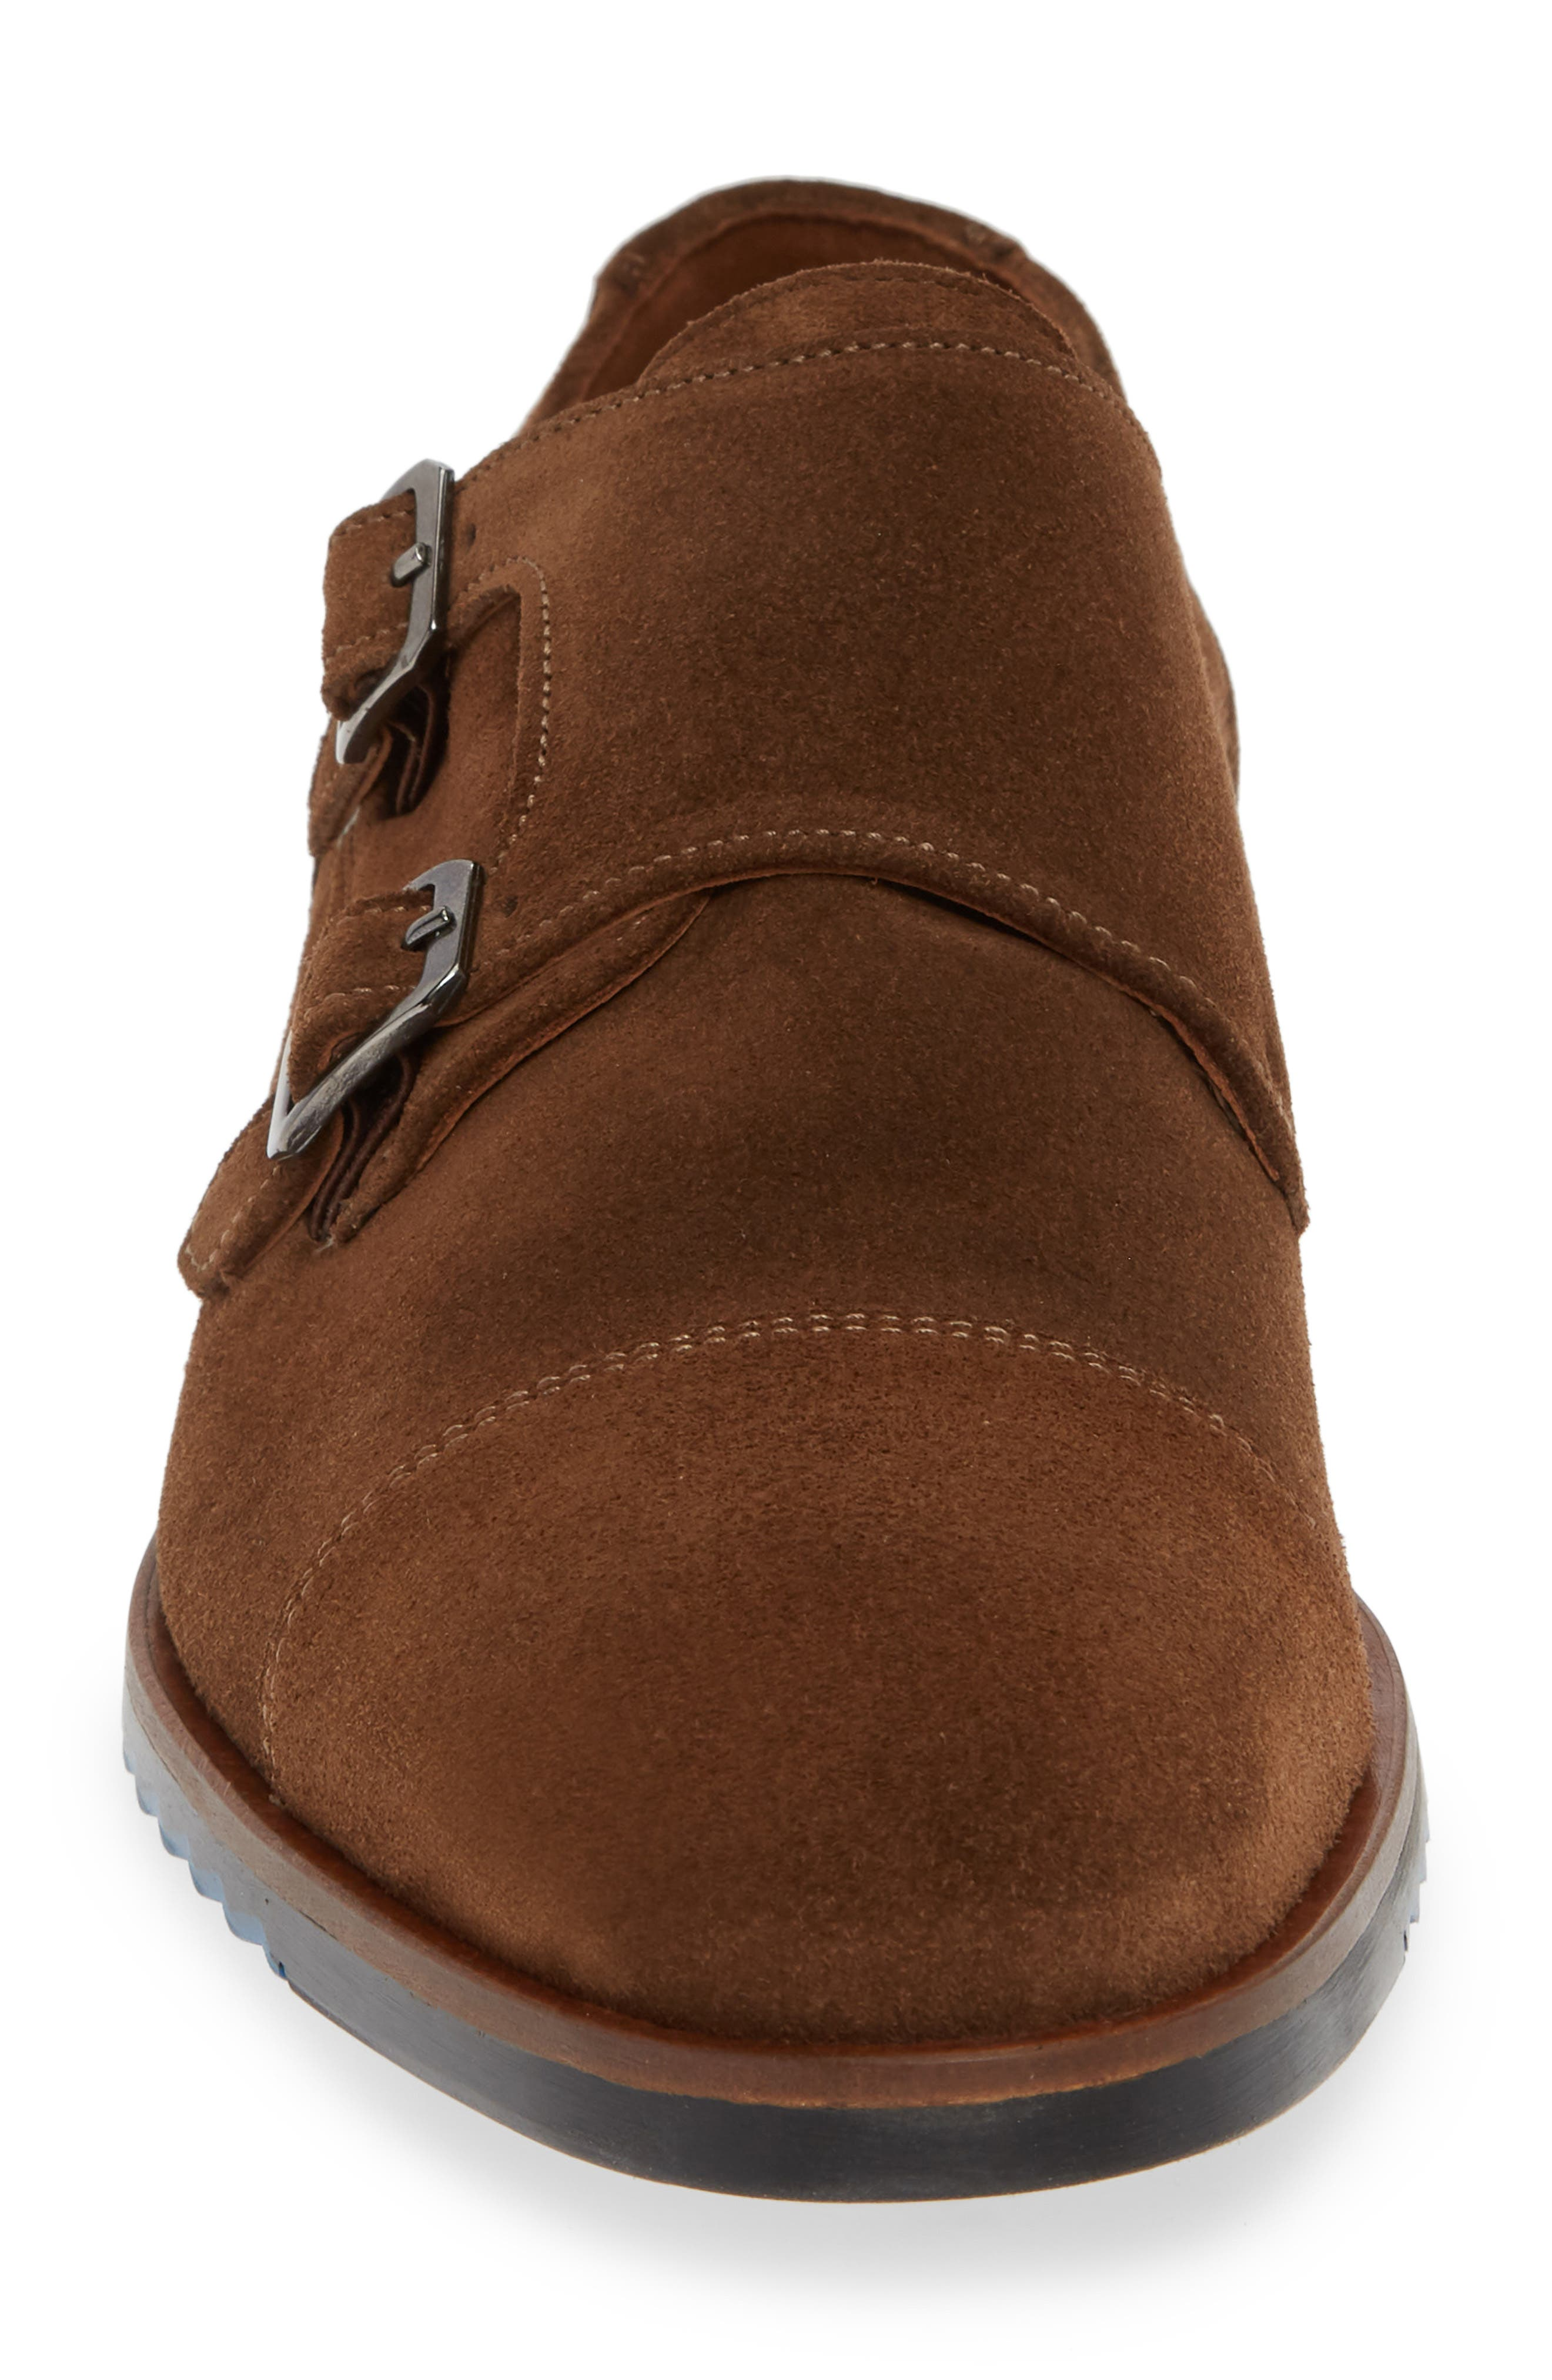 Darrow Double Monk Strap Shoe,                             Alternate thumbnail 4, color,                             CIGAR BROWN SUEDE